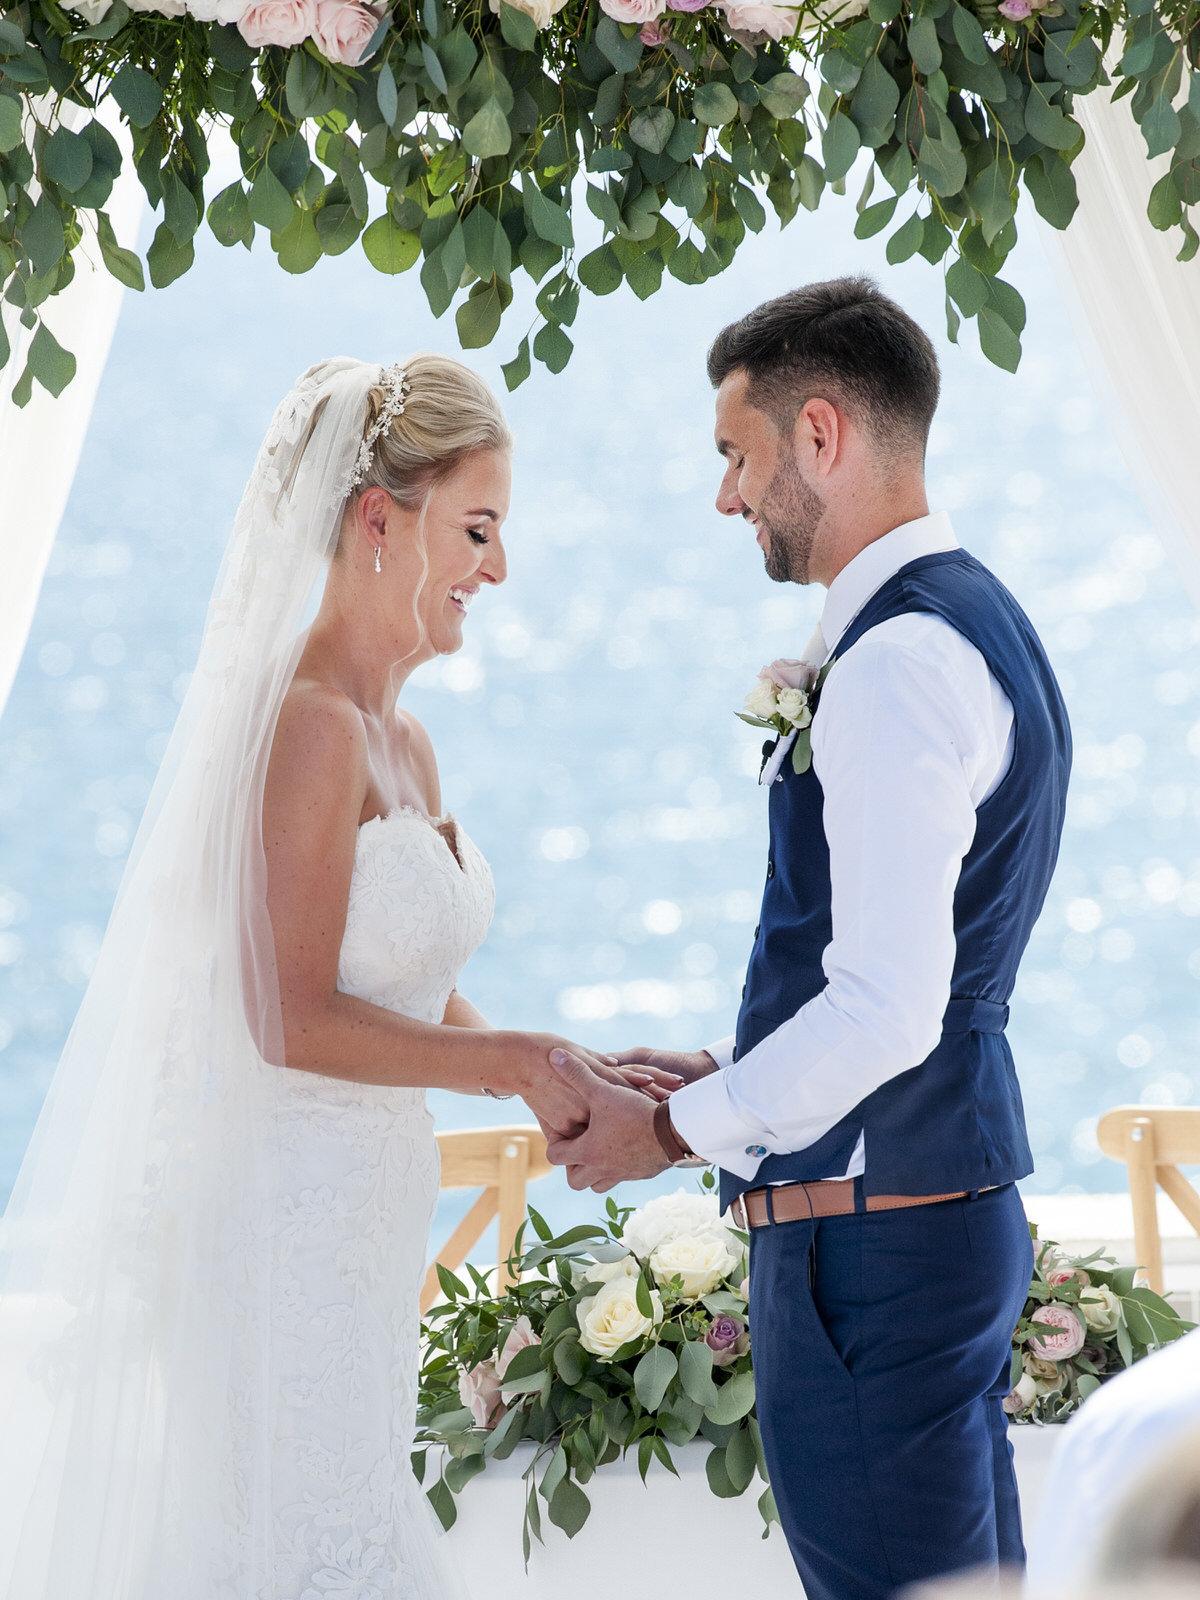 Algarve Wedding Photography Portfolio - Blush Photography